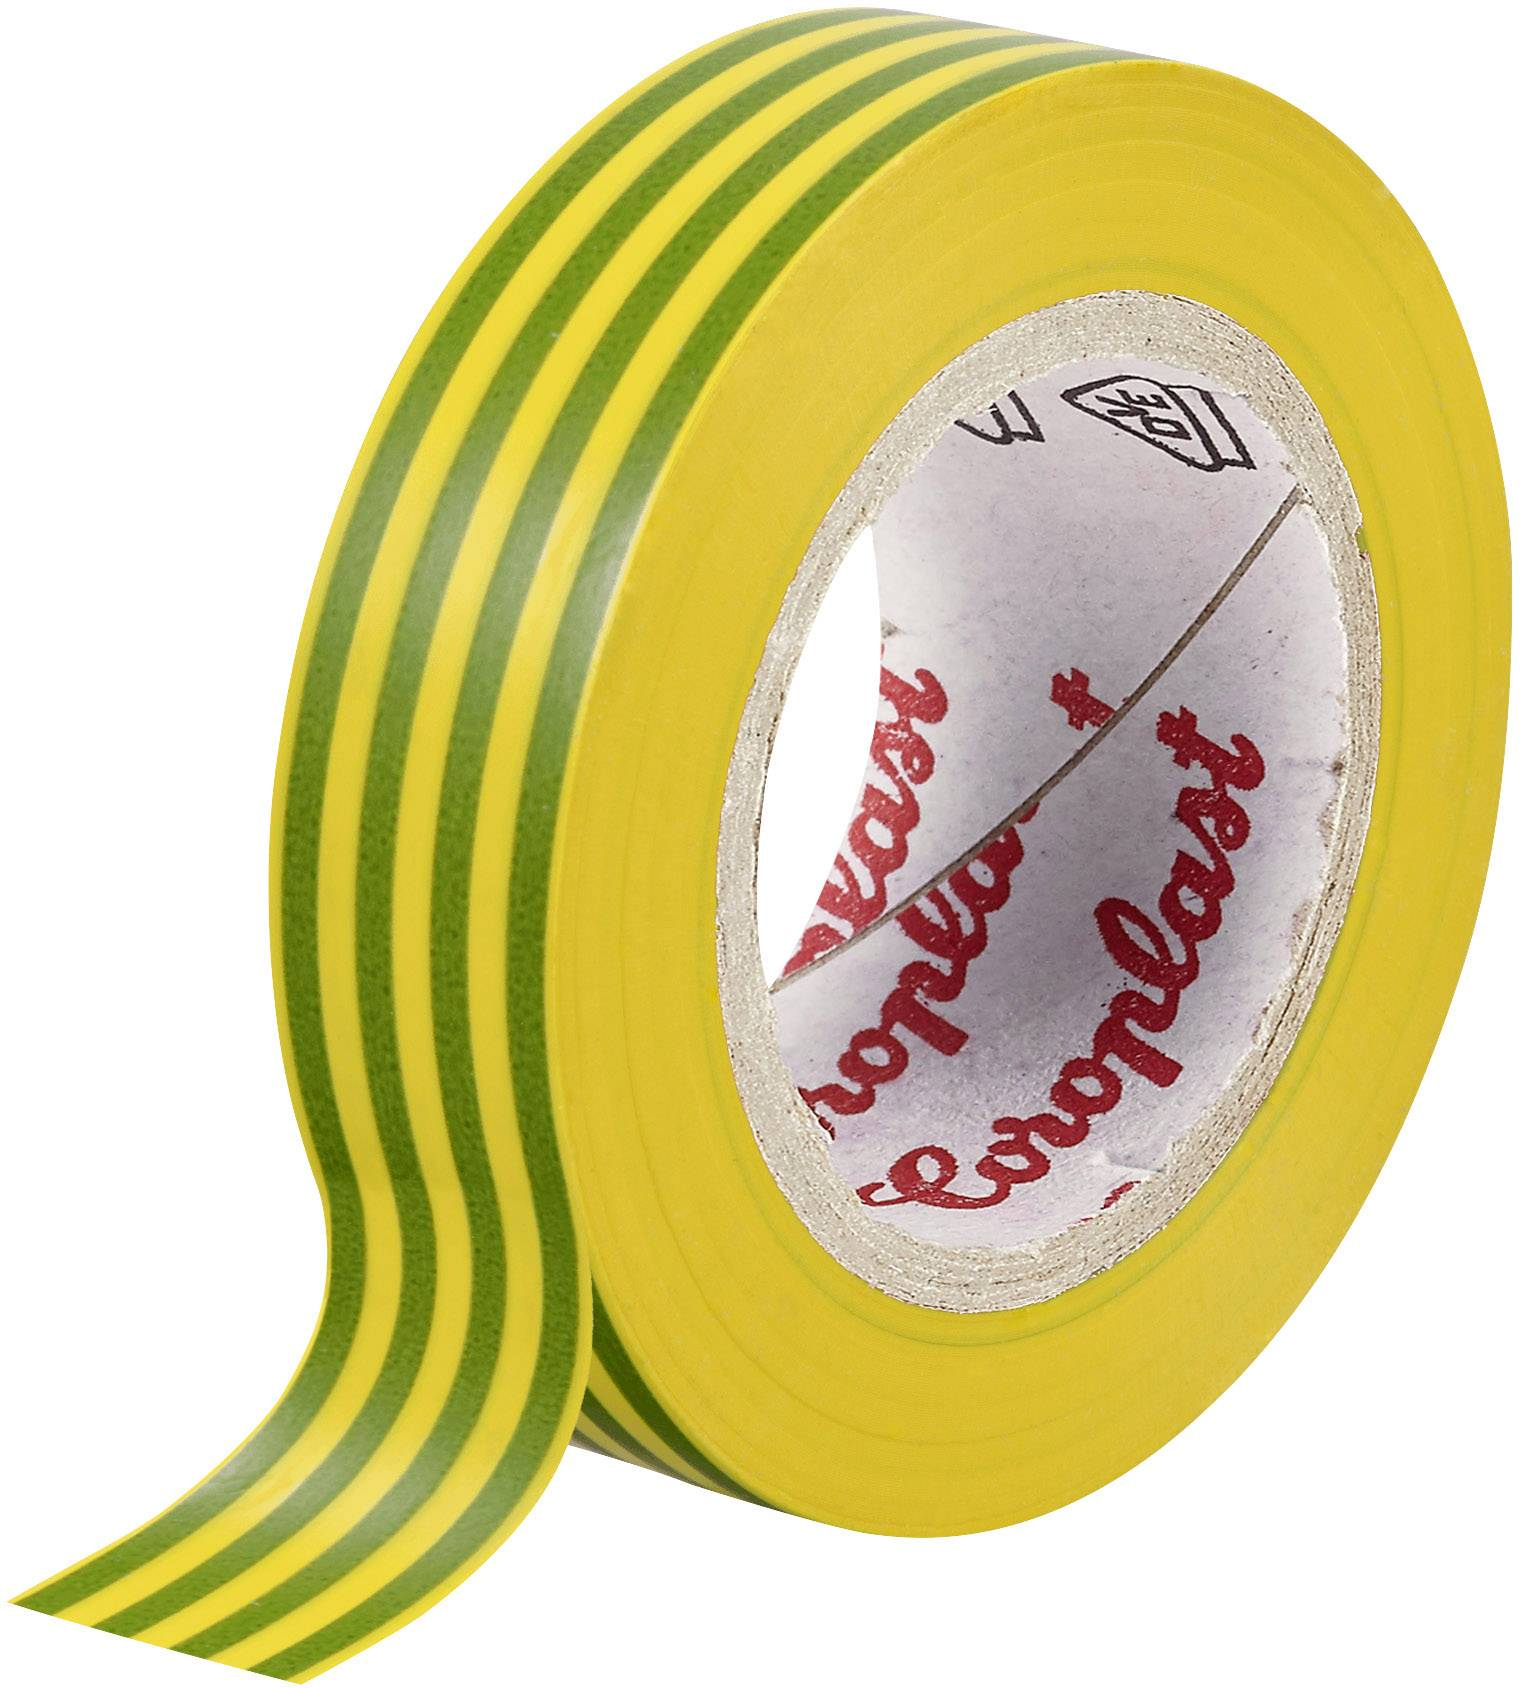 Izolačná páska Coroplast 302 302, (d x š) 10 m x 15 mm, zelenožltá, 1 roliek